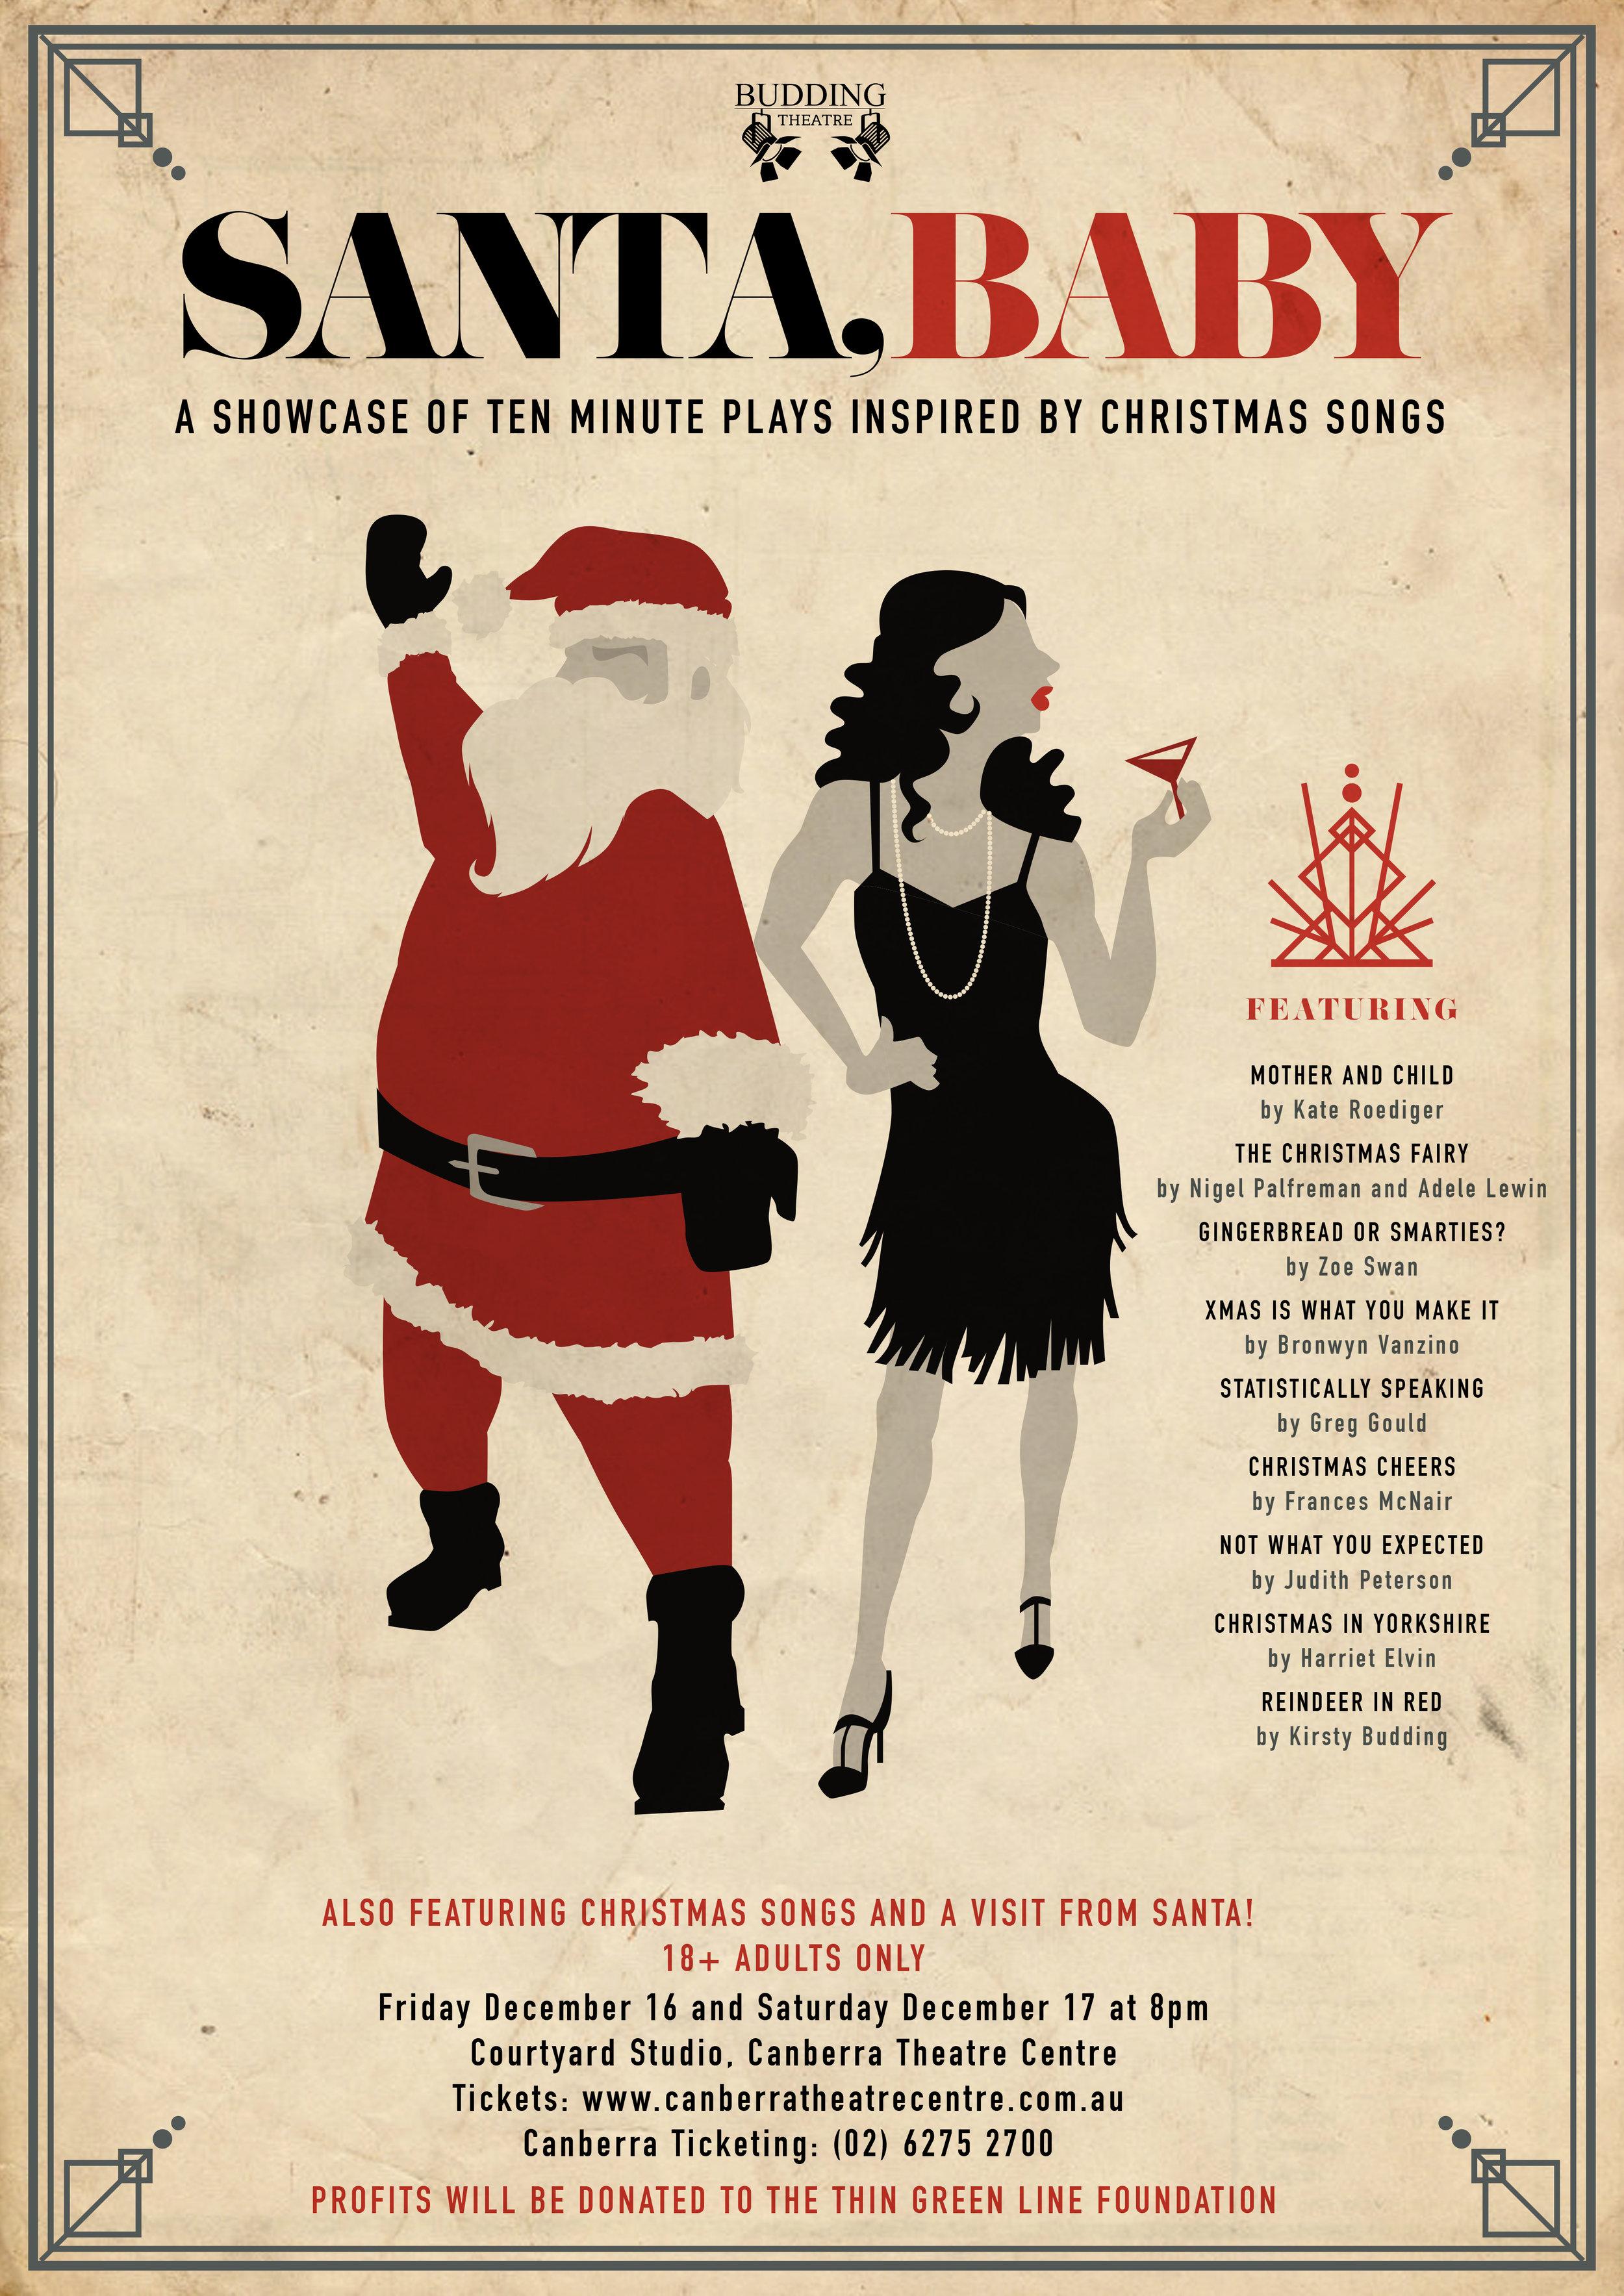 Santa Baby Budding Theatre